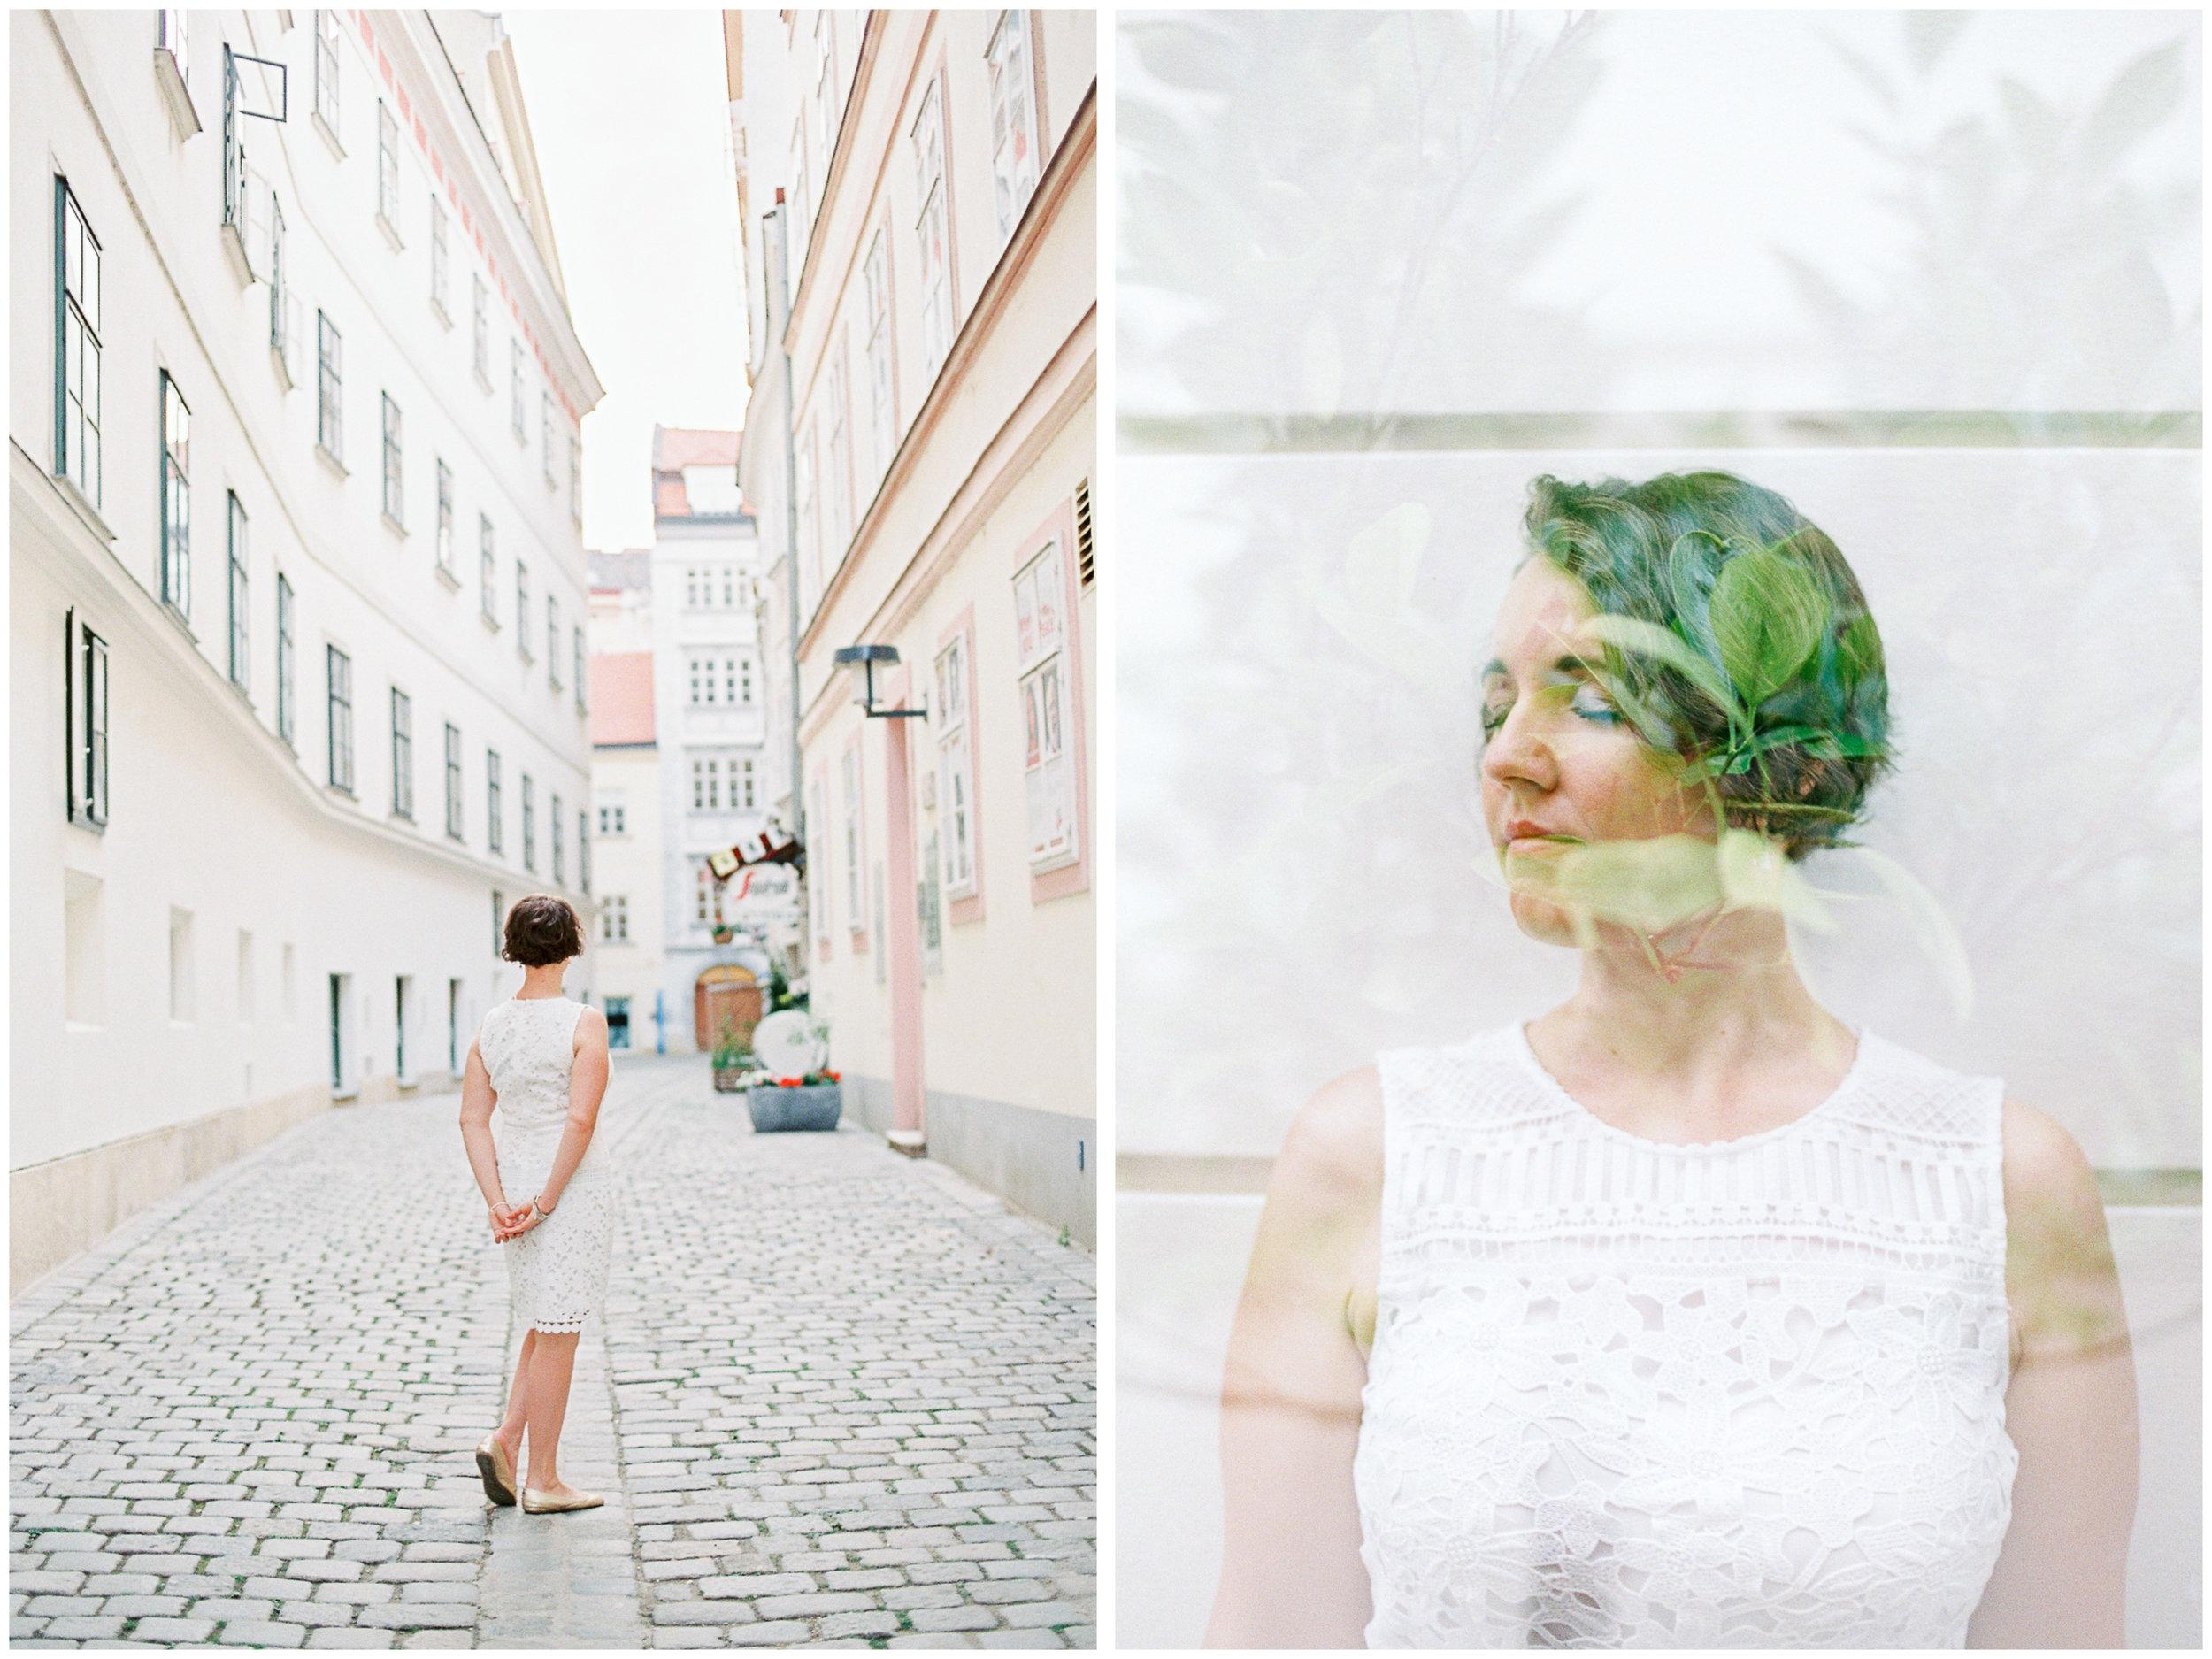 Double Exposure Blogger Portraits | Stephansplatz, Vienna | Michelle Mock Photography | Vienna Photographer | Canon 1V | Fuji400H